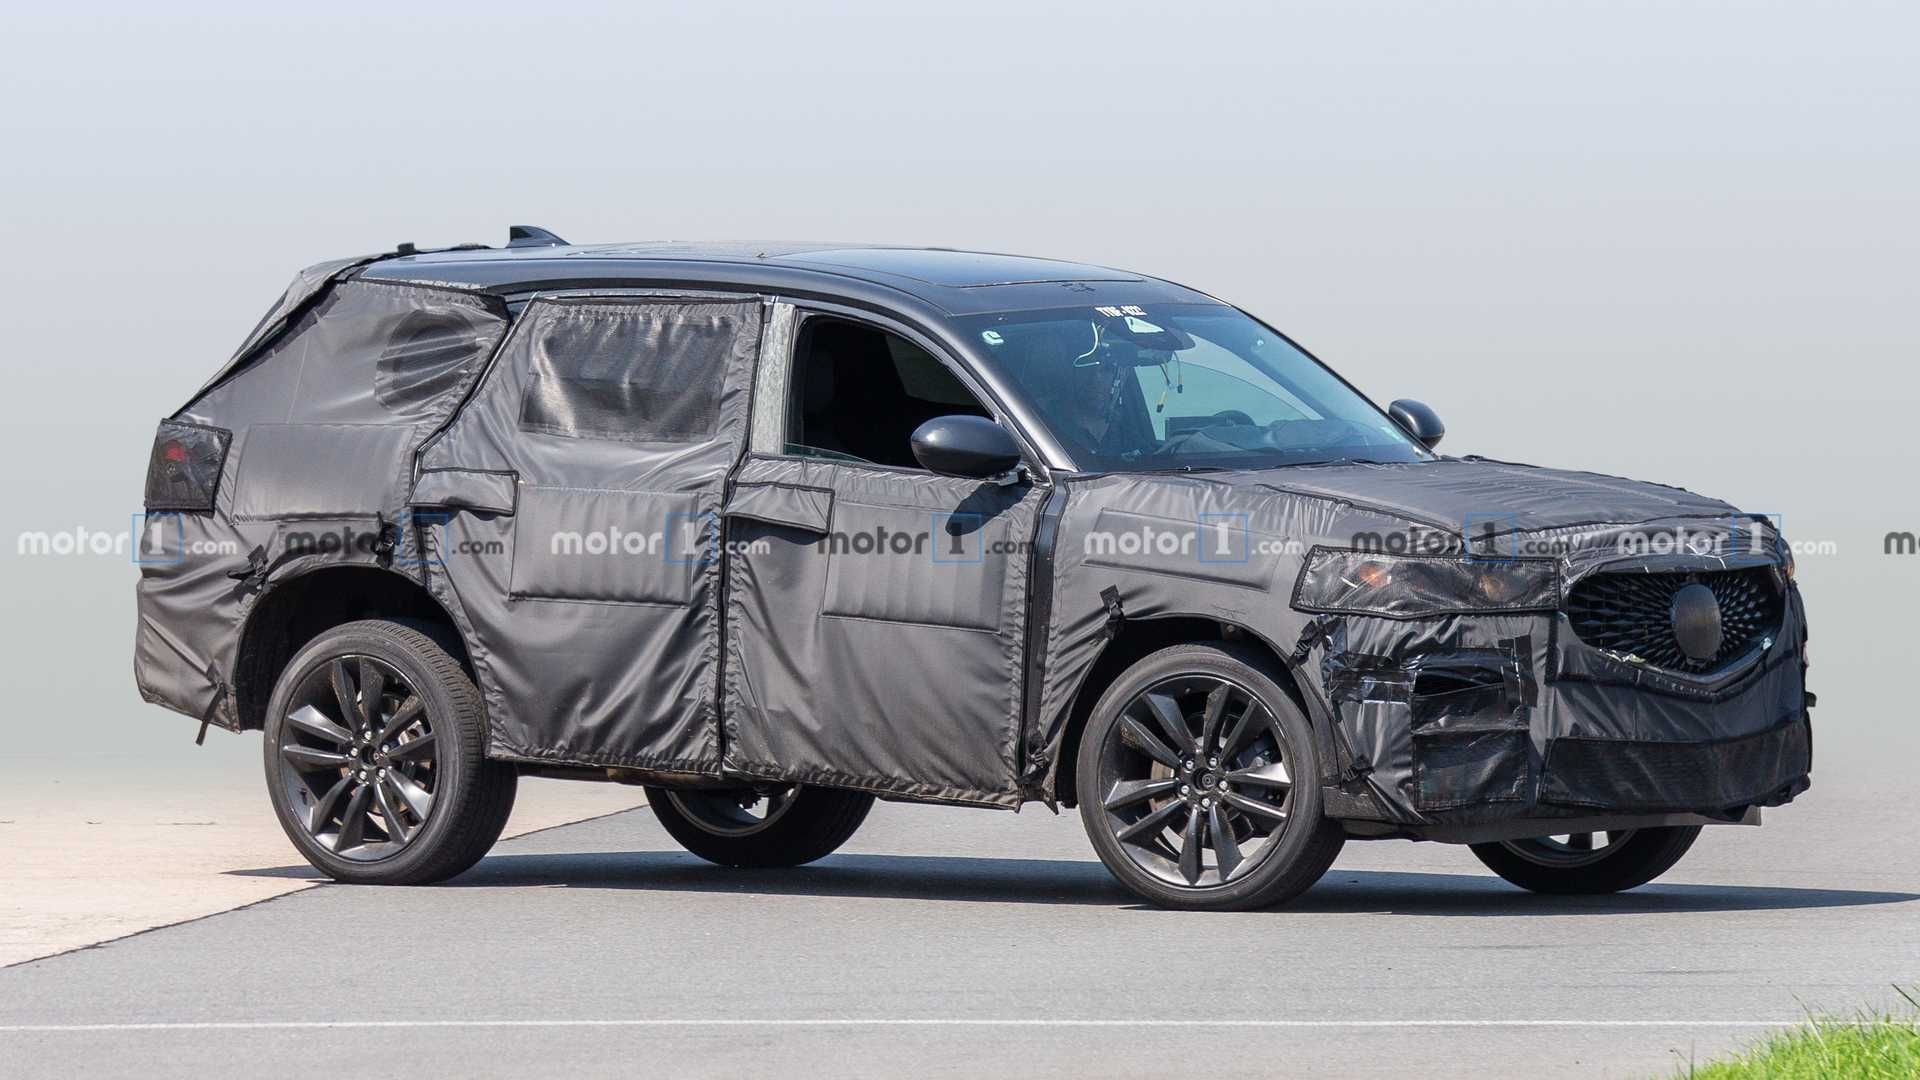 2021 Acura Mdx Sport Hybrid Worth, Design and Evaluate